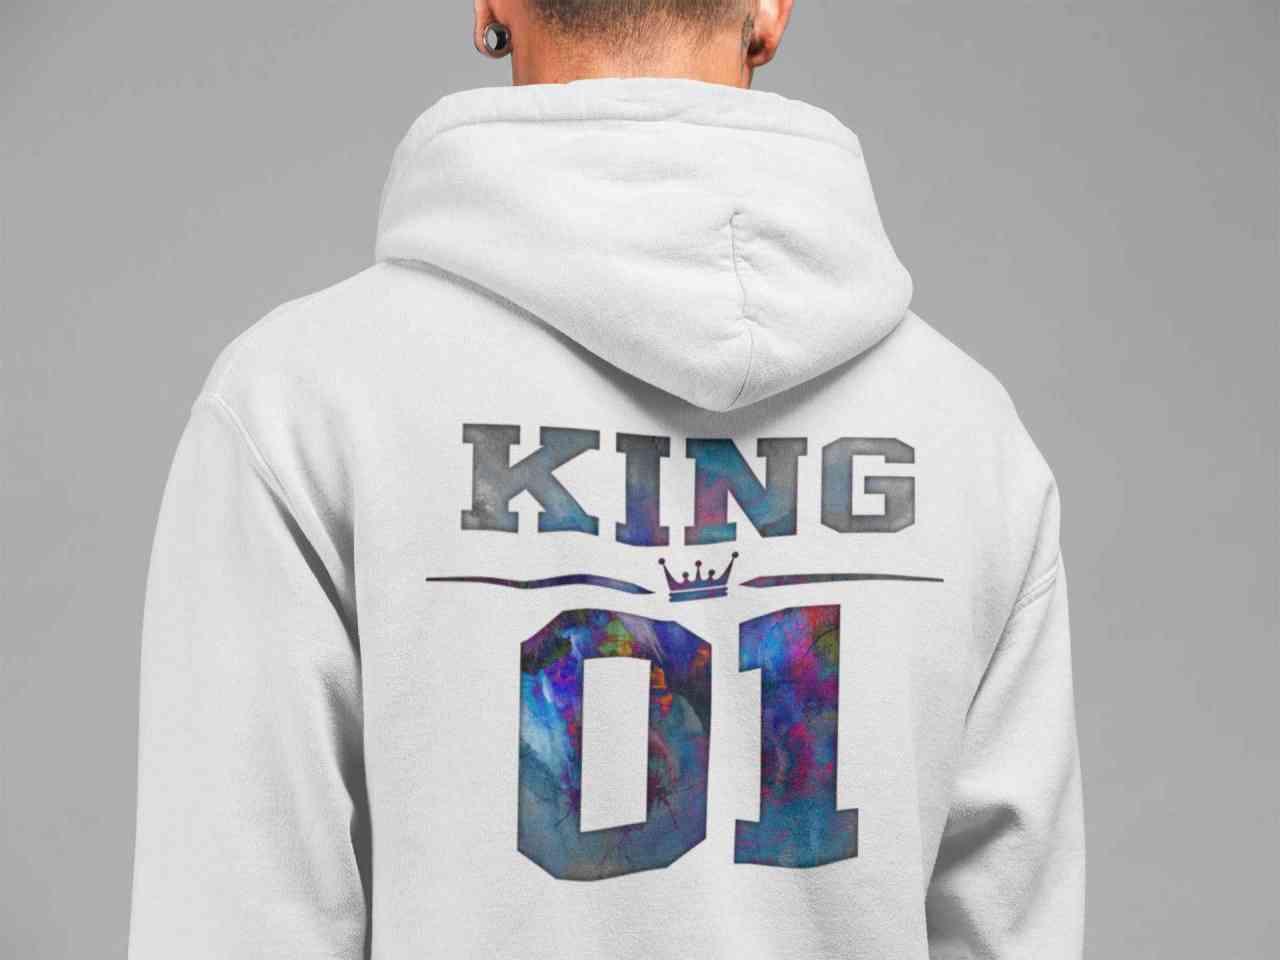 King - Princess - Prince | 2x Hoodie | Papa - Tochter/Sohn | Unisex Pulli